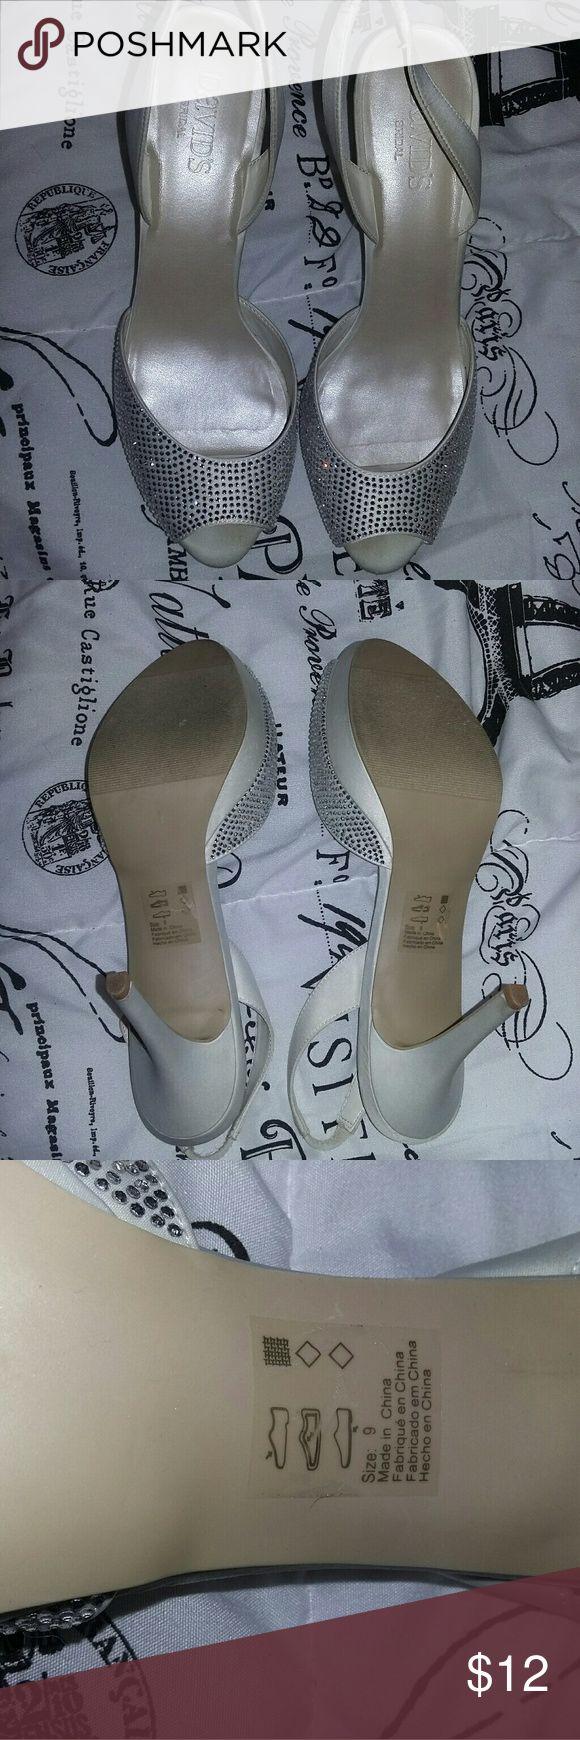 David's bridal wedding high heels David's bridal wedding high heel shoes. Size 9 . only wore for a couple of hours. David's Bridal Shoes Heels